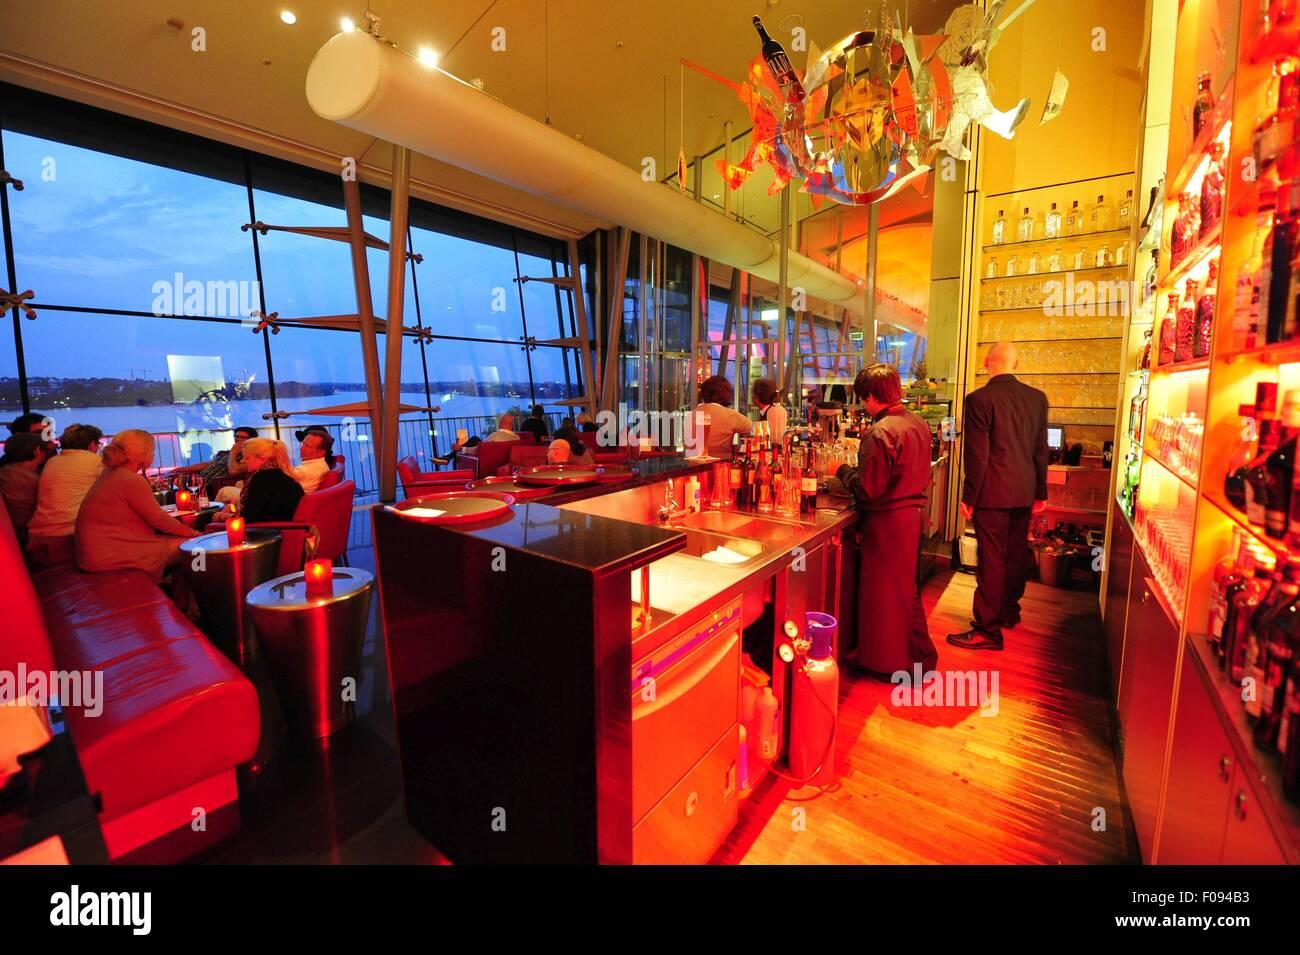 Ciel De Paris Franzosische Restaurant | upowersc.com